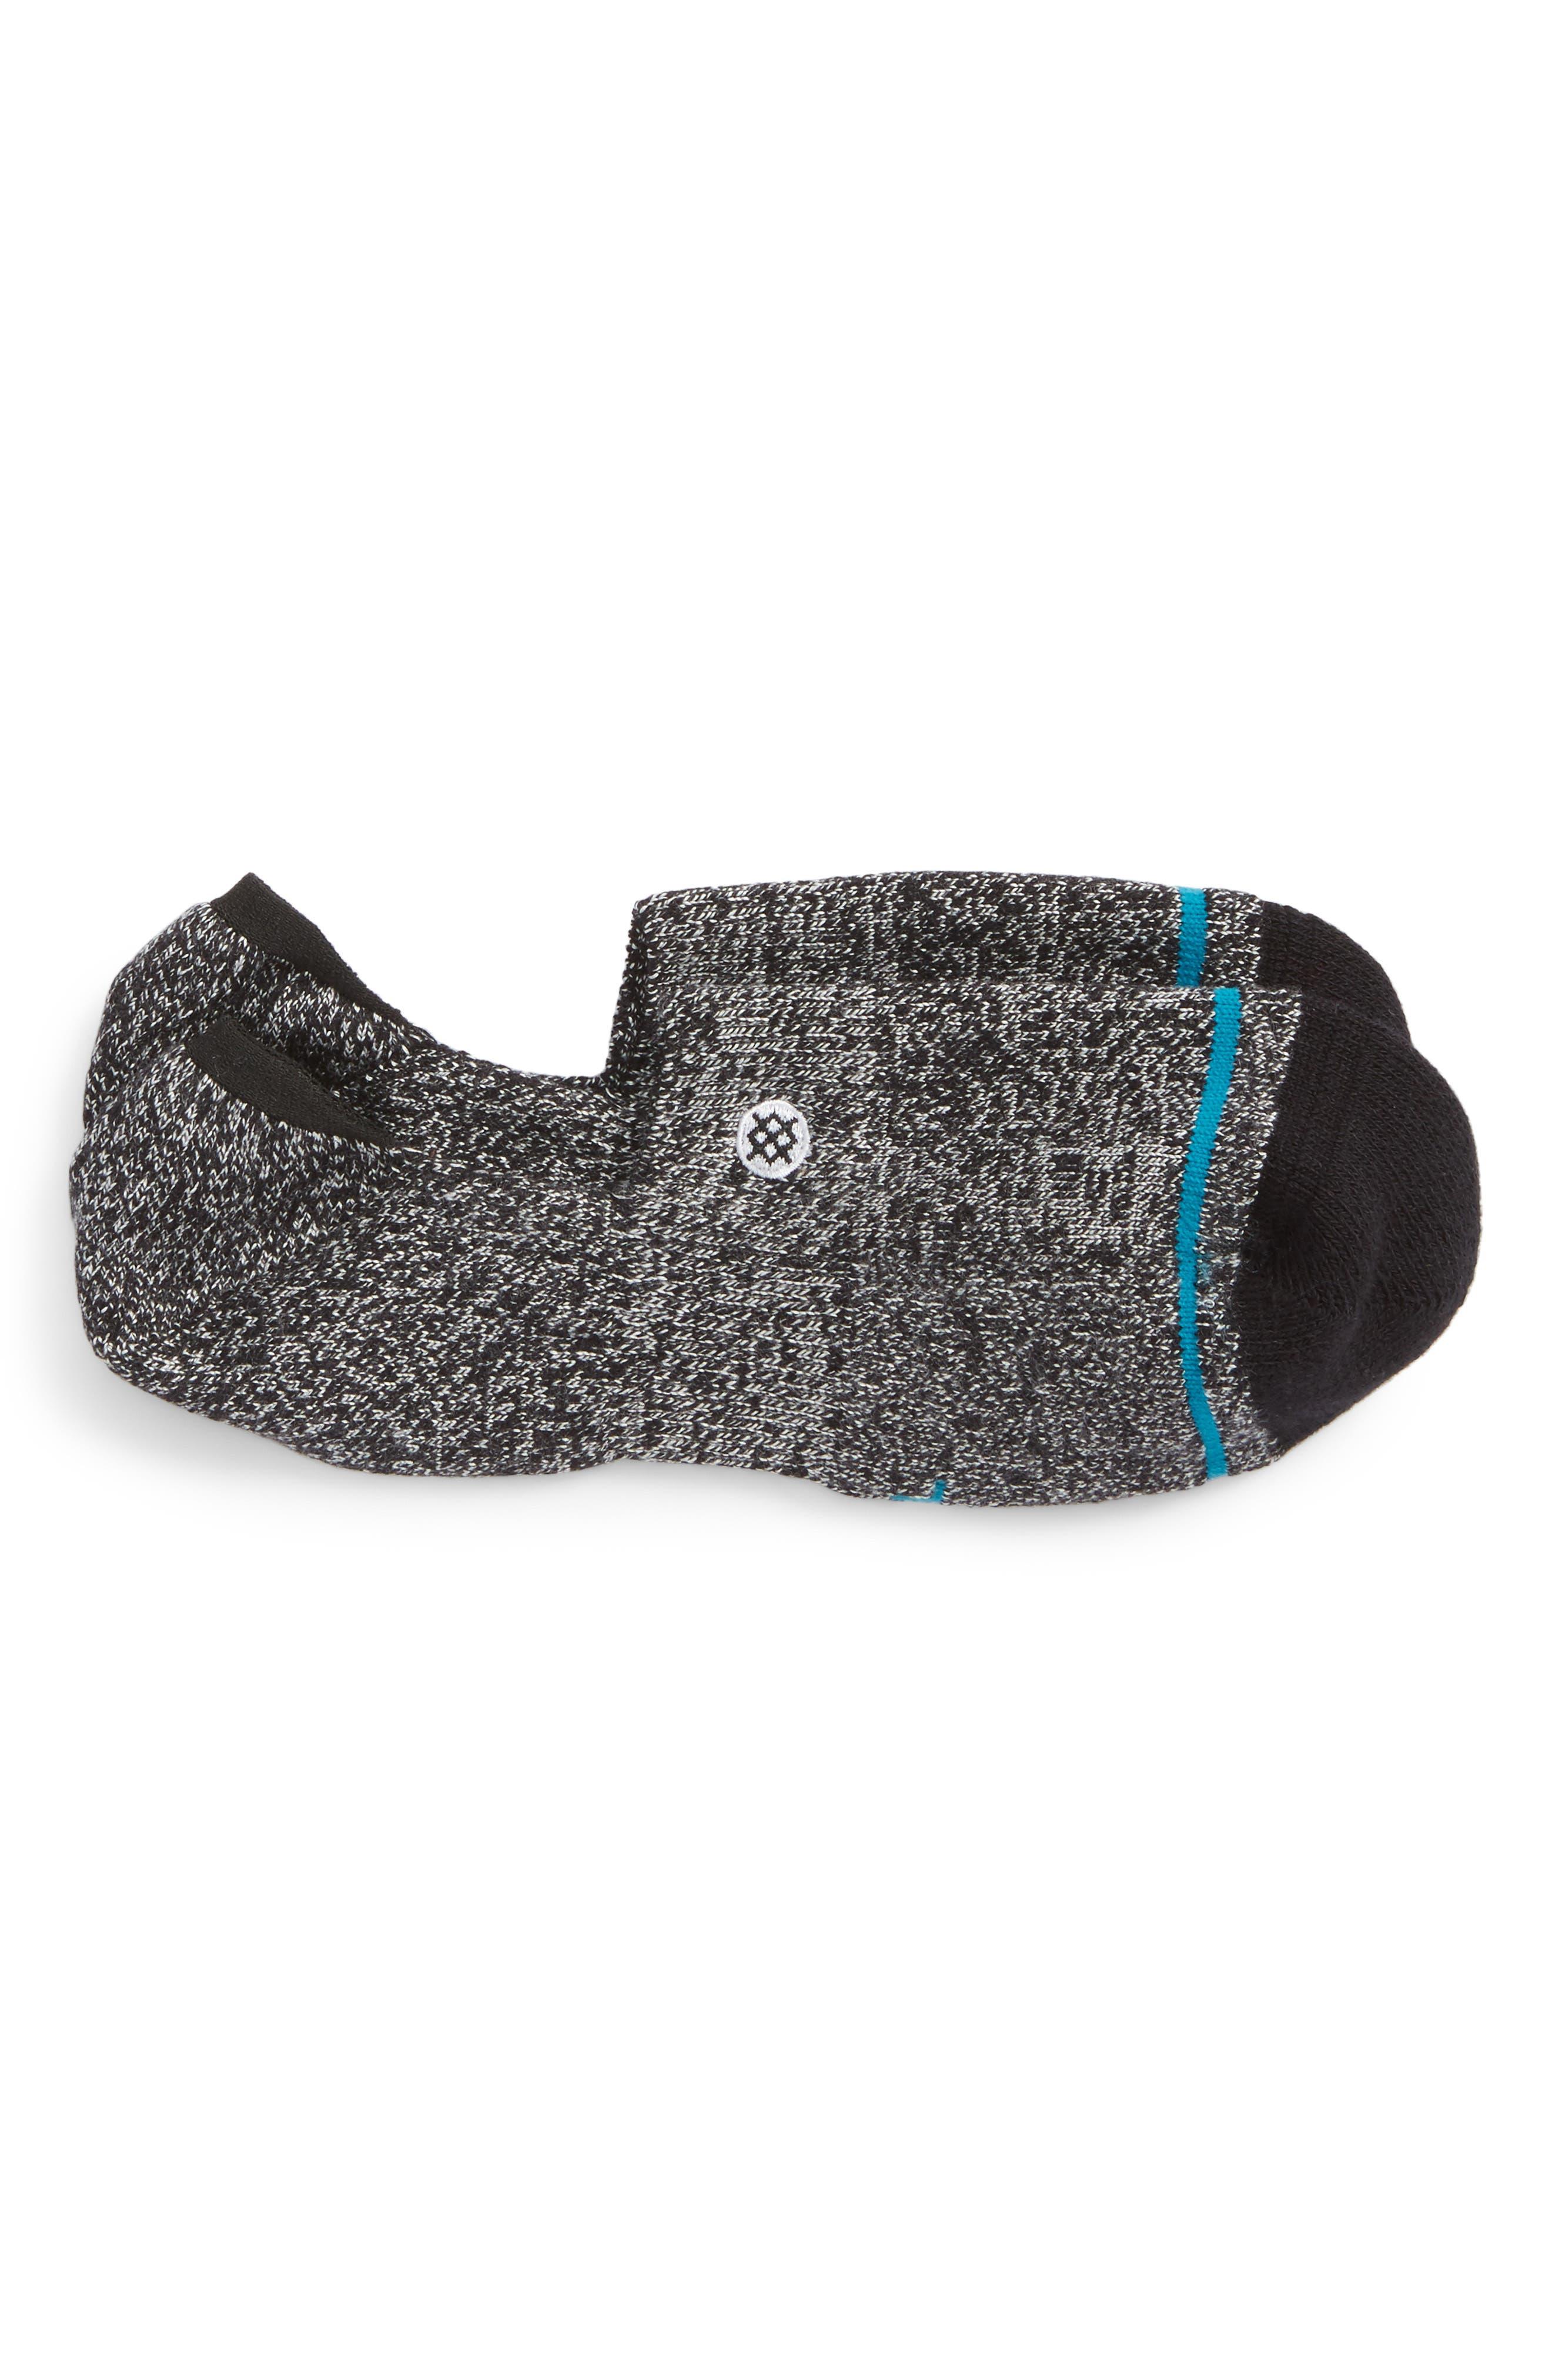 Moore No-Show Socks,                             Main thumbnail 1, color,                             BLACK